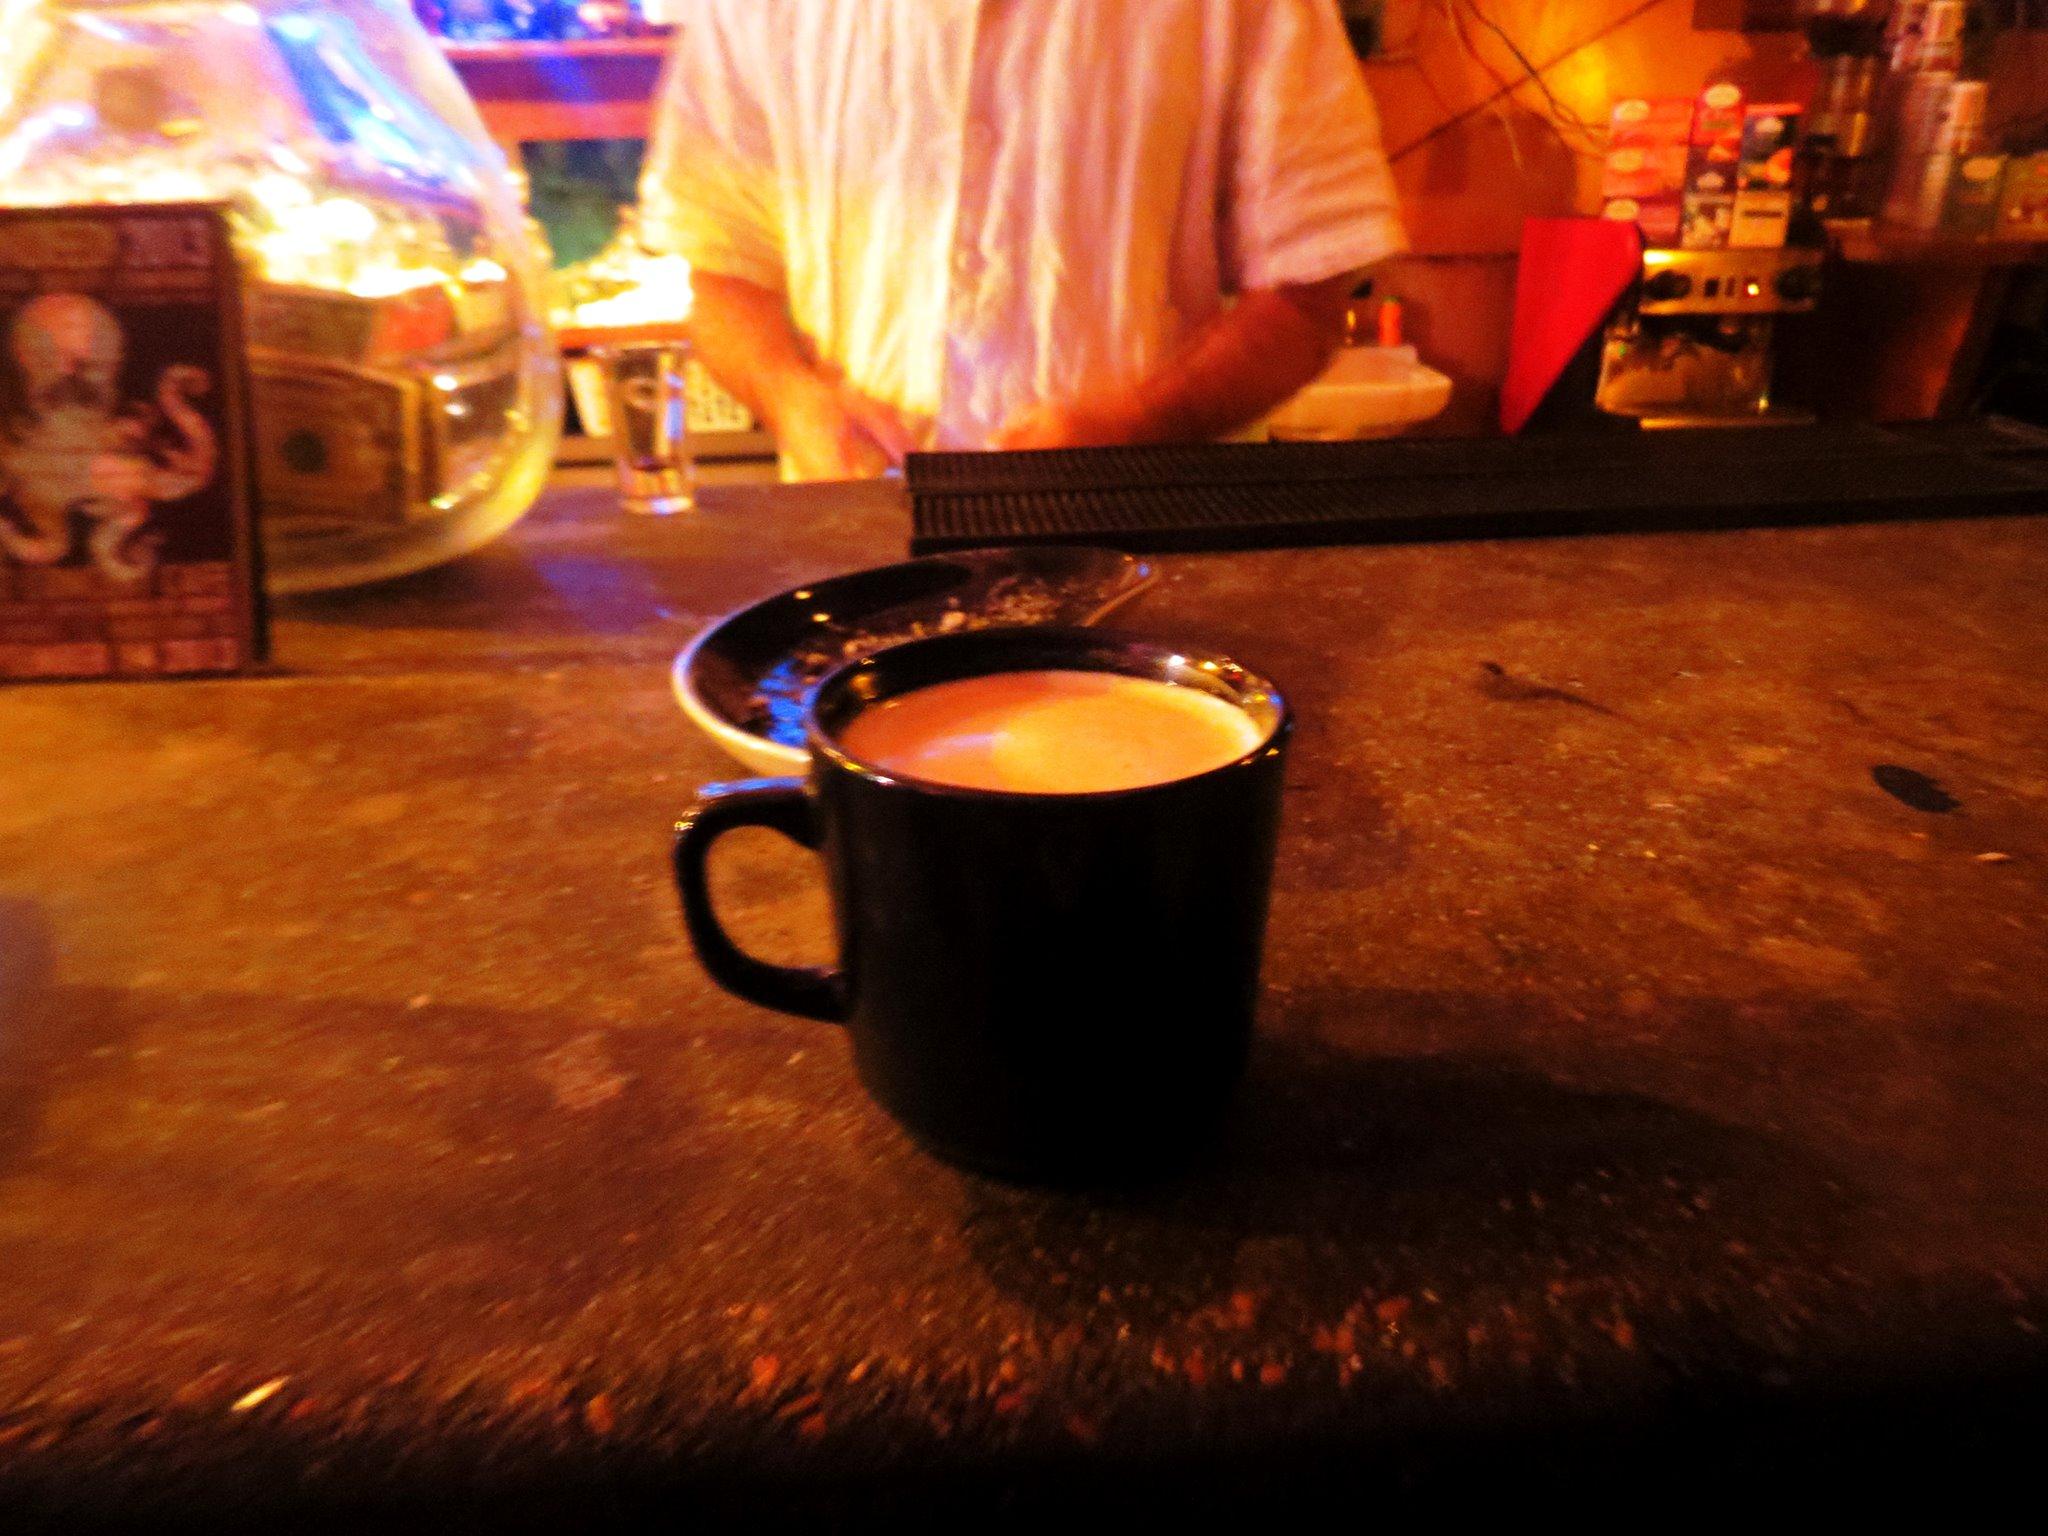 esspresso tequila and latte